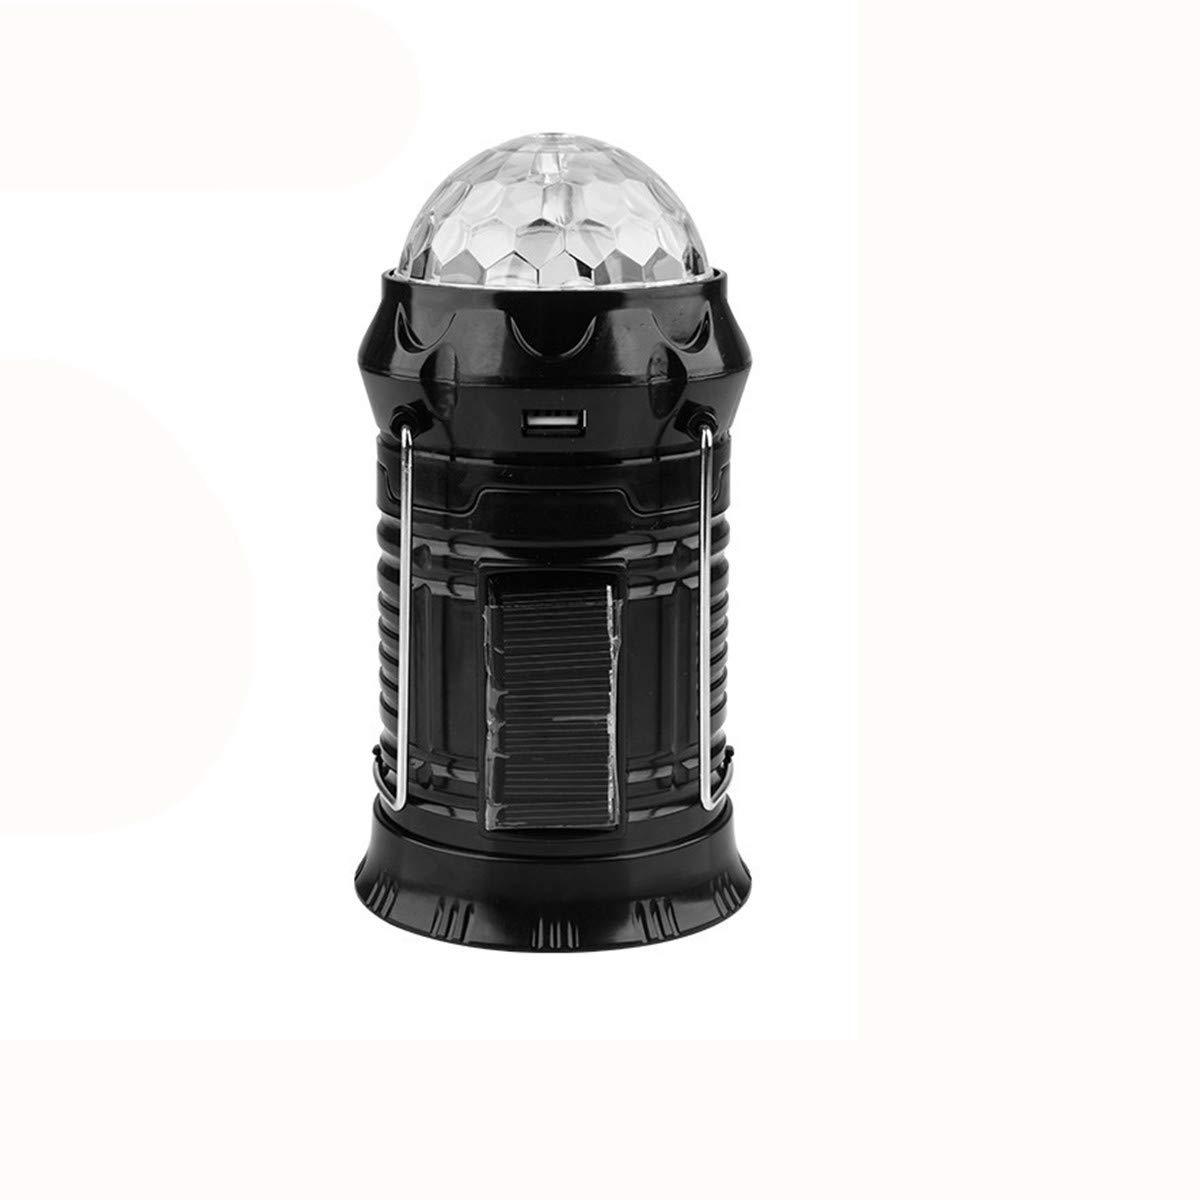 Solar Power Rechargeable LED Flashlight Camping Tent Light Torch Lantern Lamp (Black)